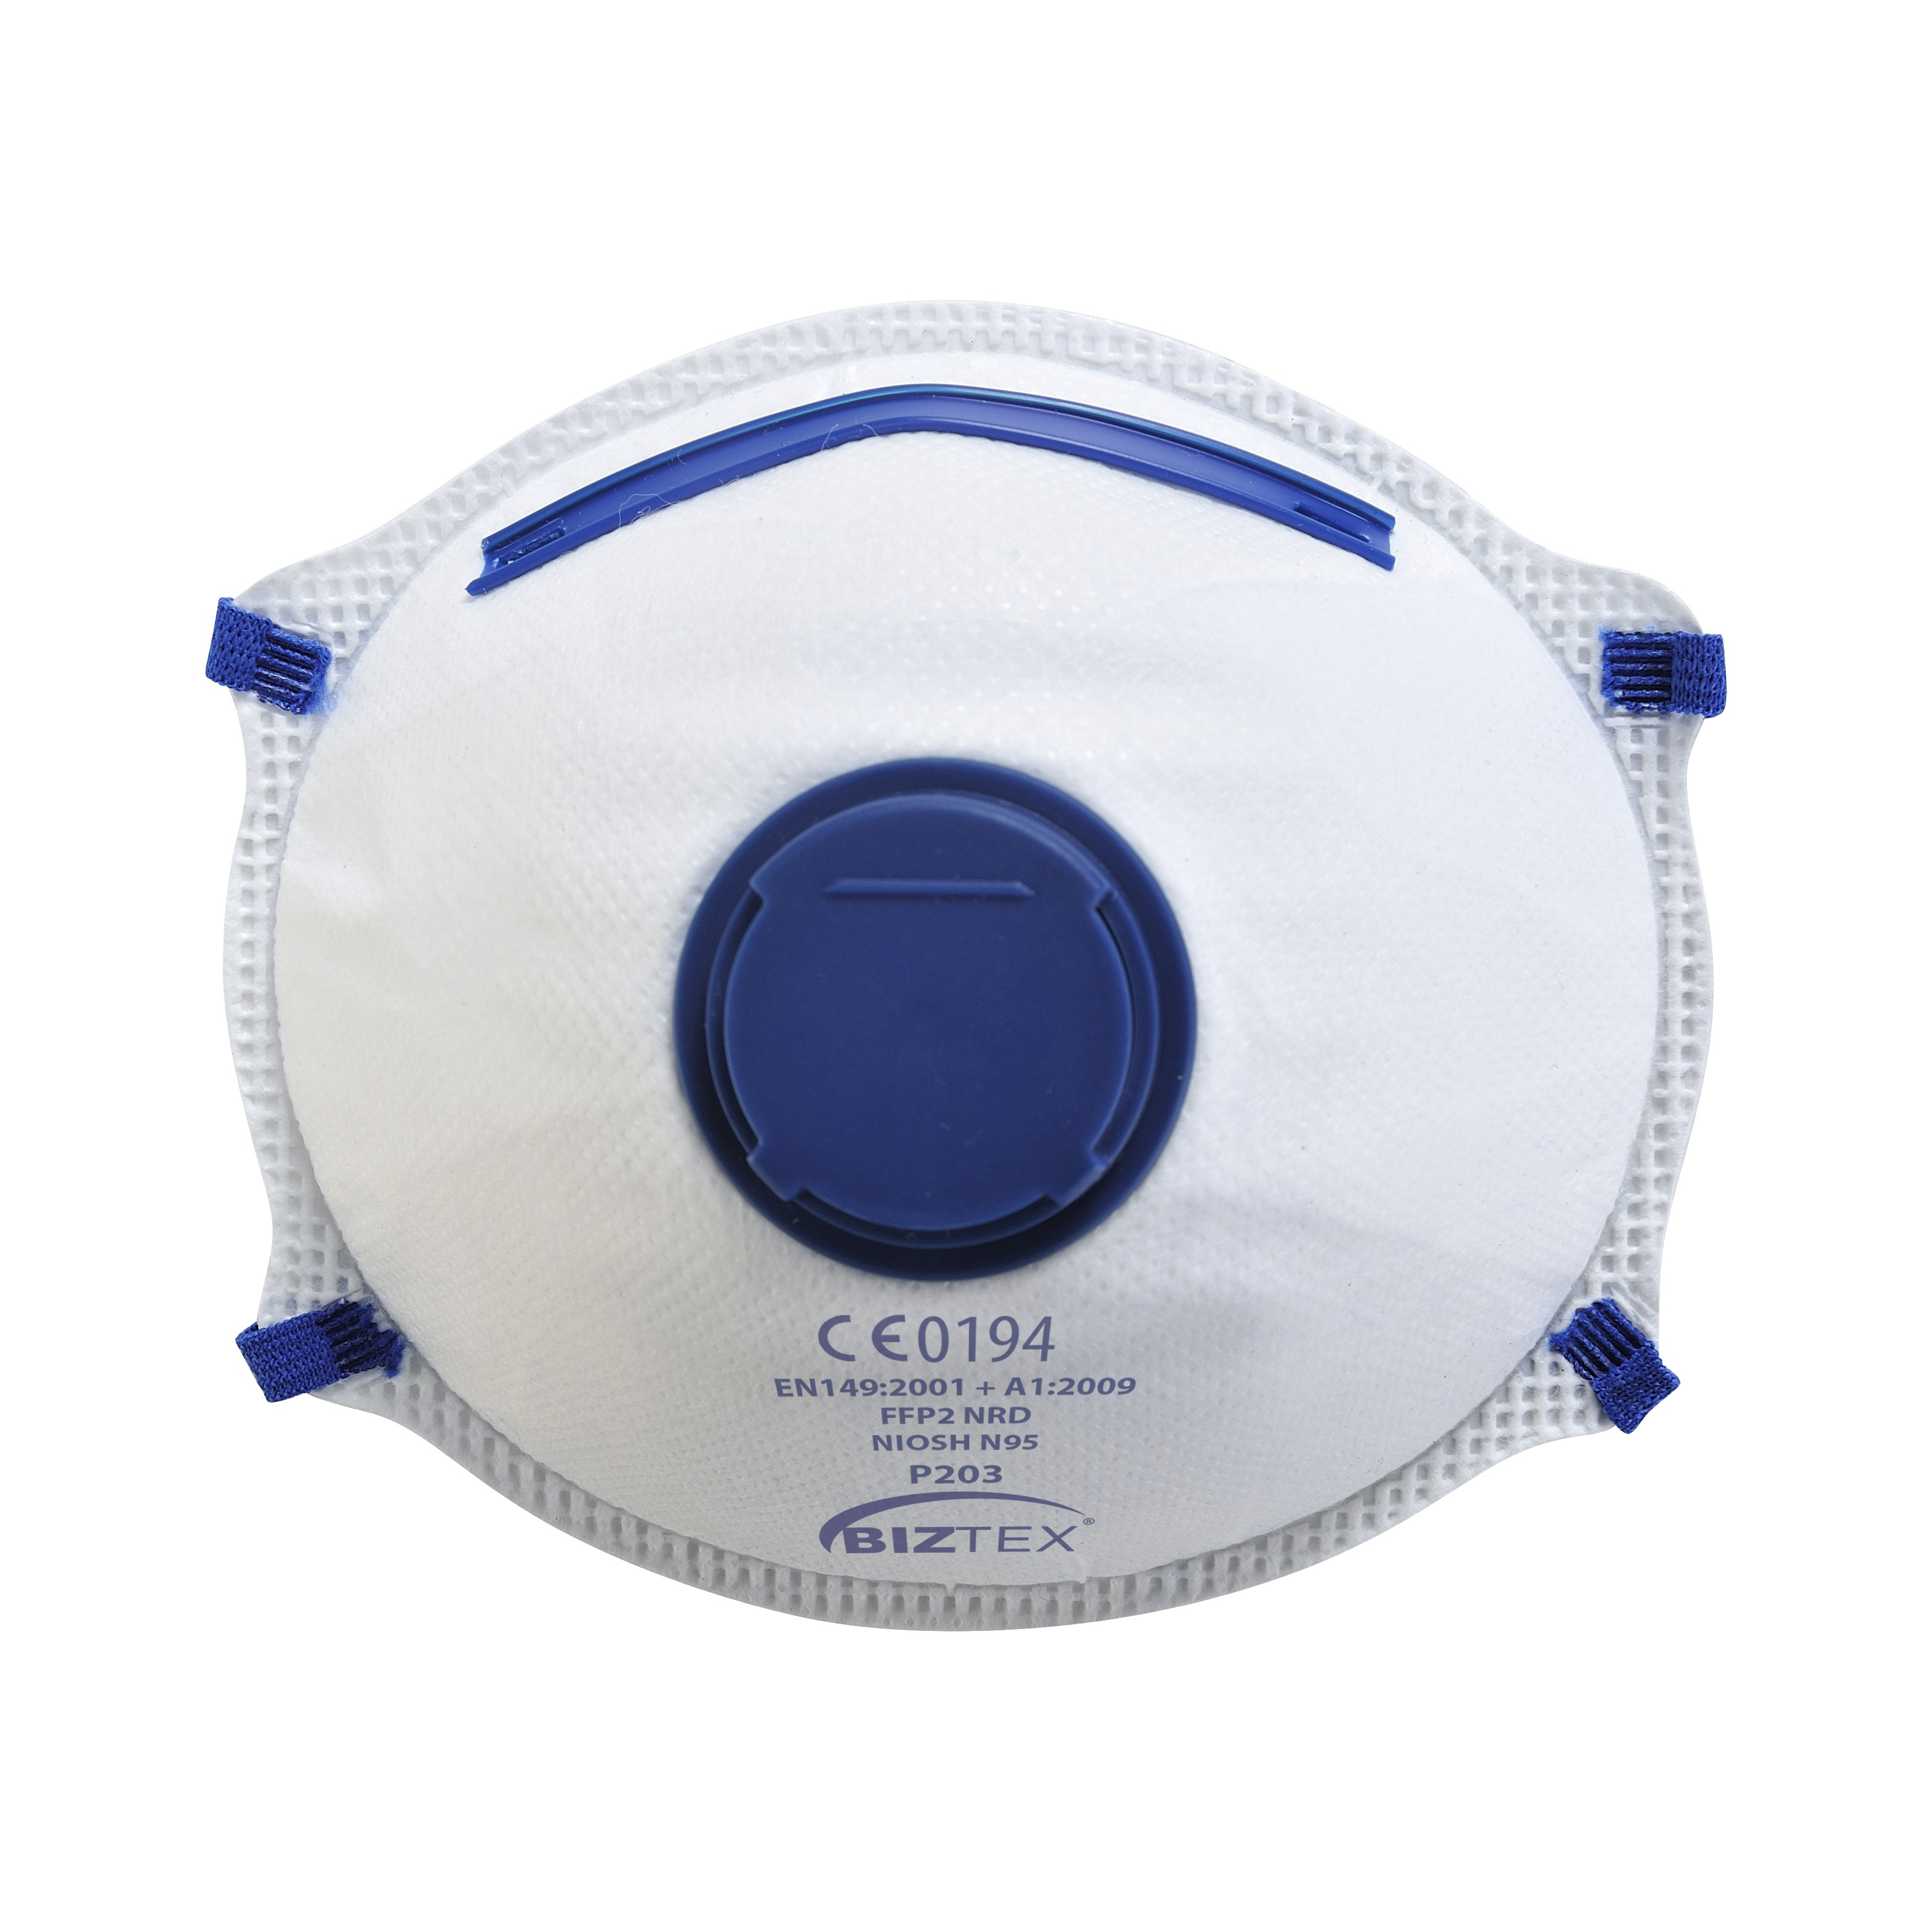 masque jetable ffp2